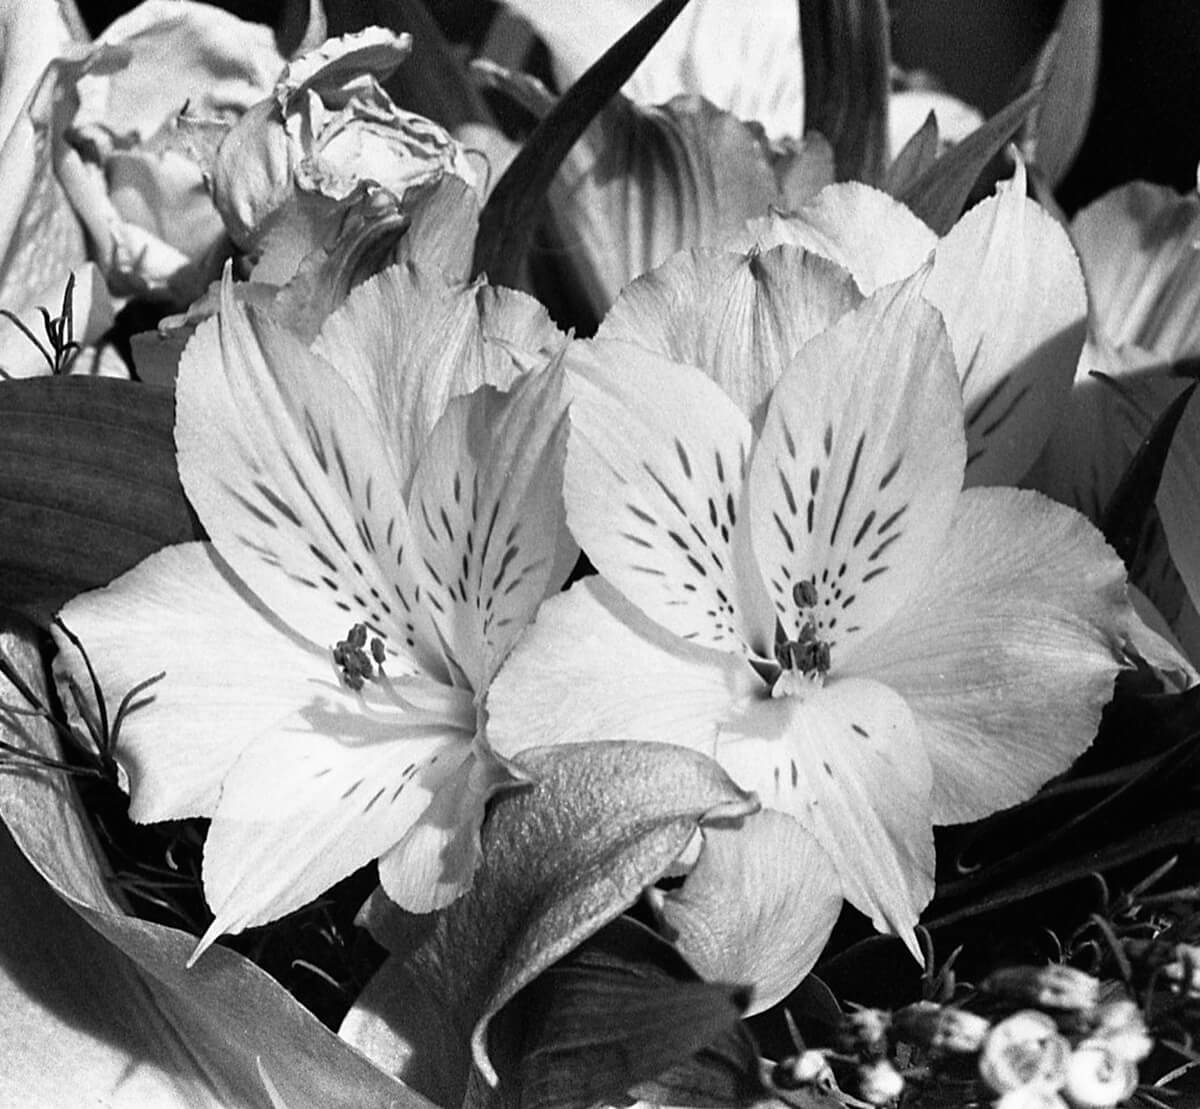 5 Frames (+1)... Of beautiful B&W flowers on ILFORD HP5 PLUS (35mm Format / EI 400 / Minolta X-700 + MD f/3.5 Macro Lens) - by Kathleen E. Johnson - Flower Set No.1